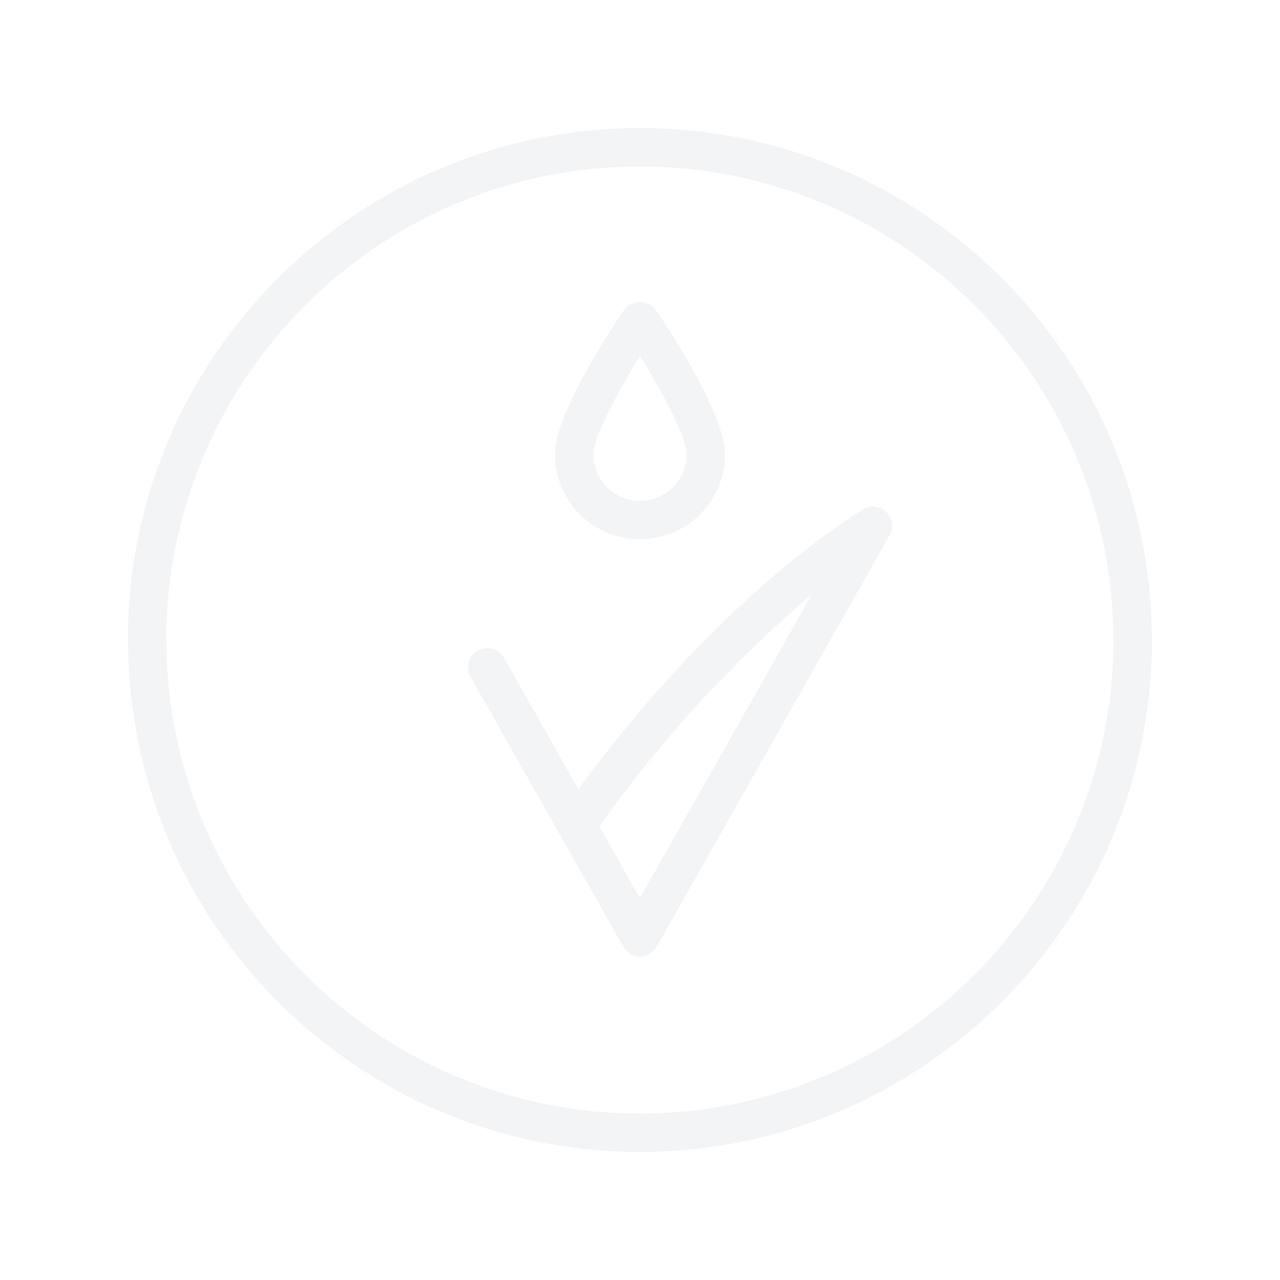 LOTTIE Arch Rival Volumising Eyebrow Powder Medium 1g